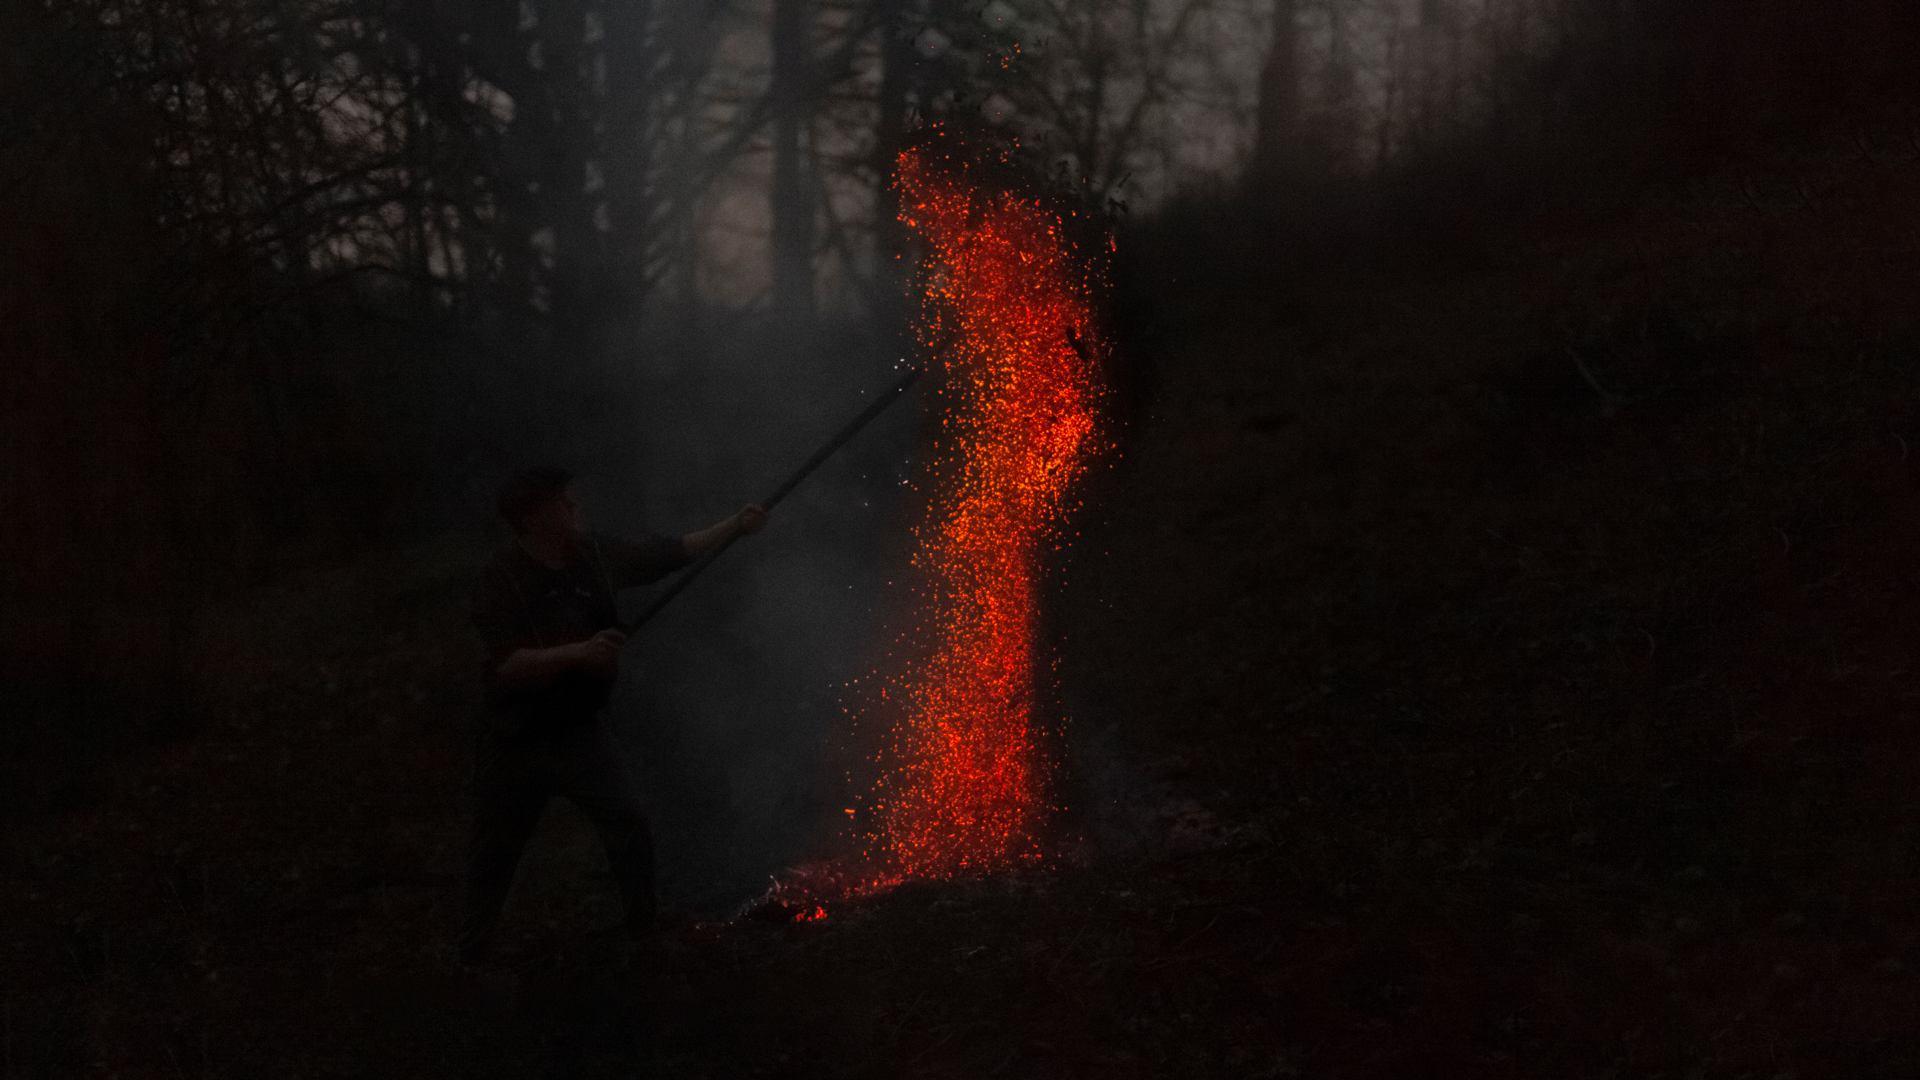 humanVsFire